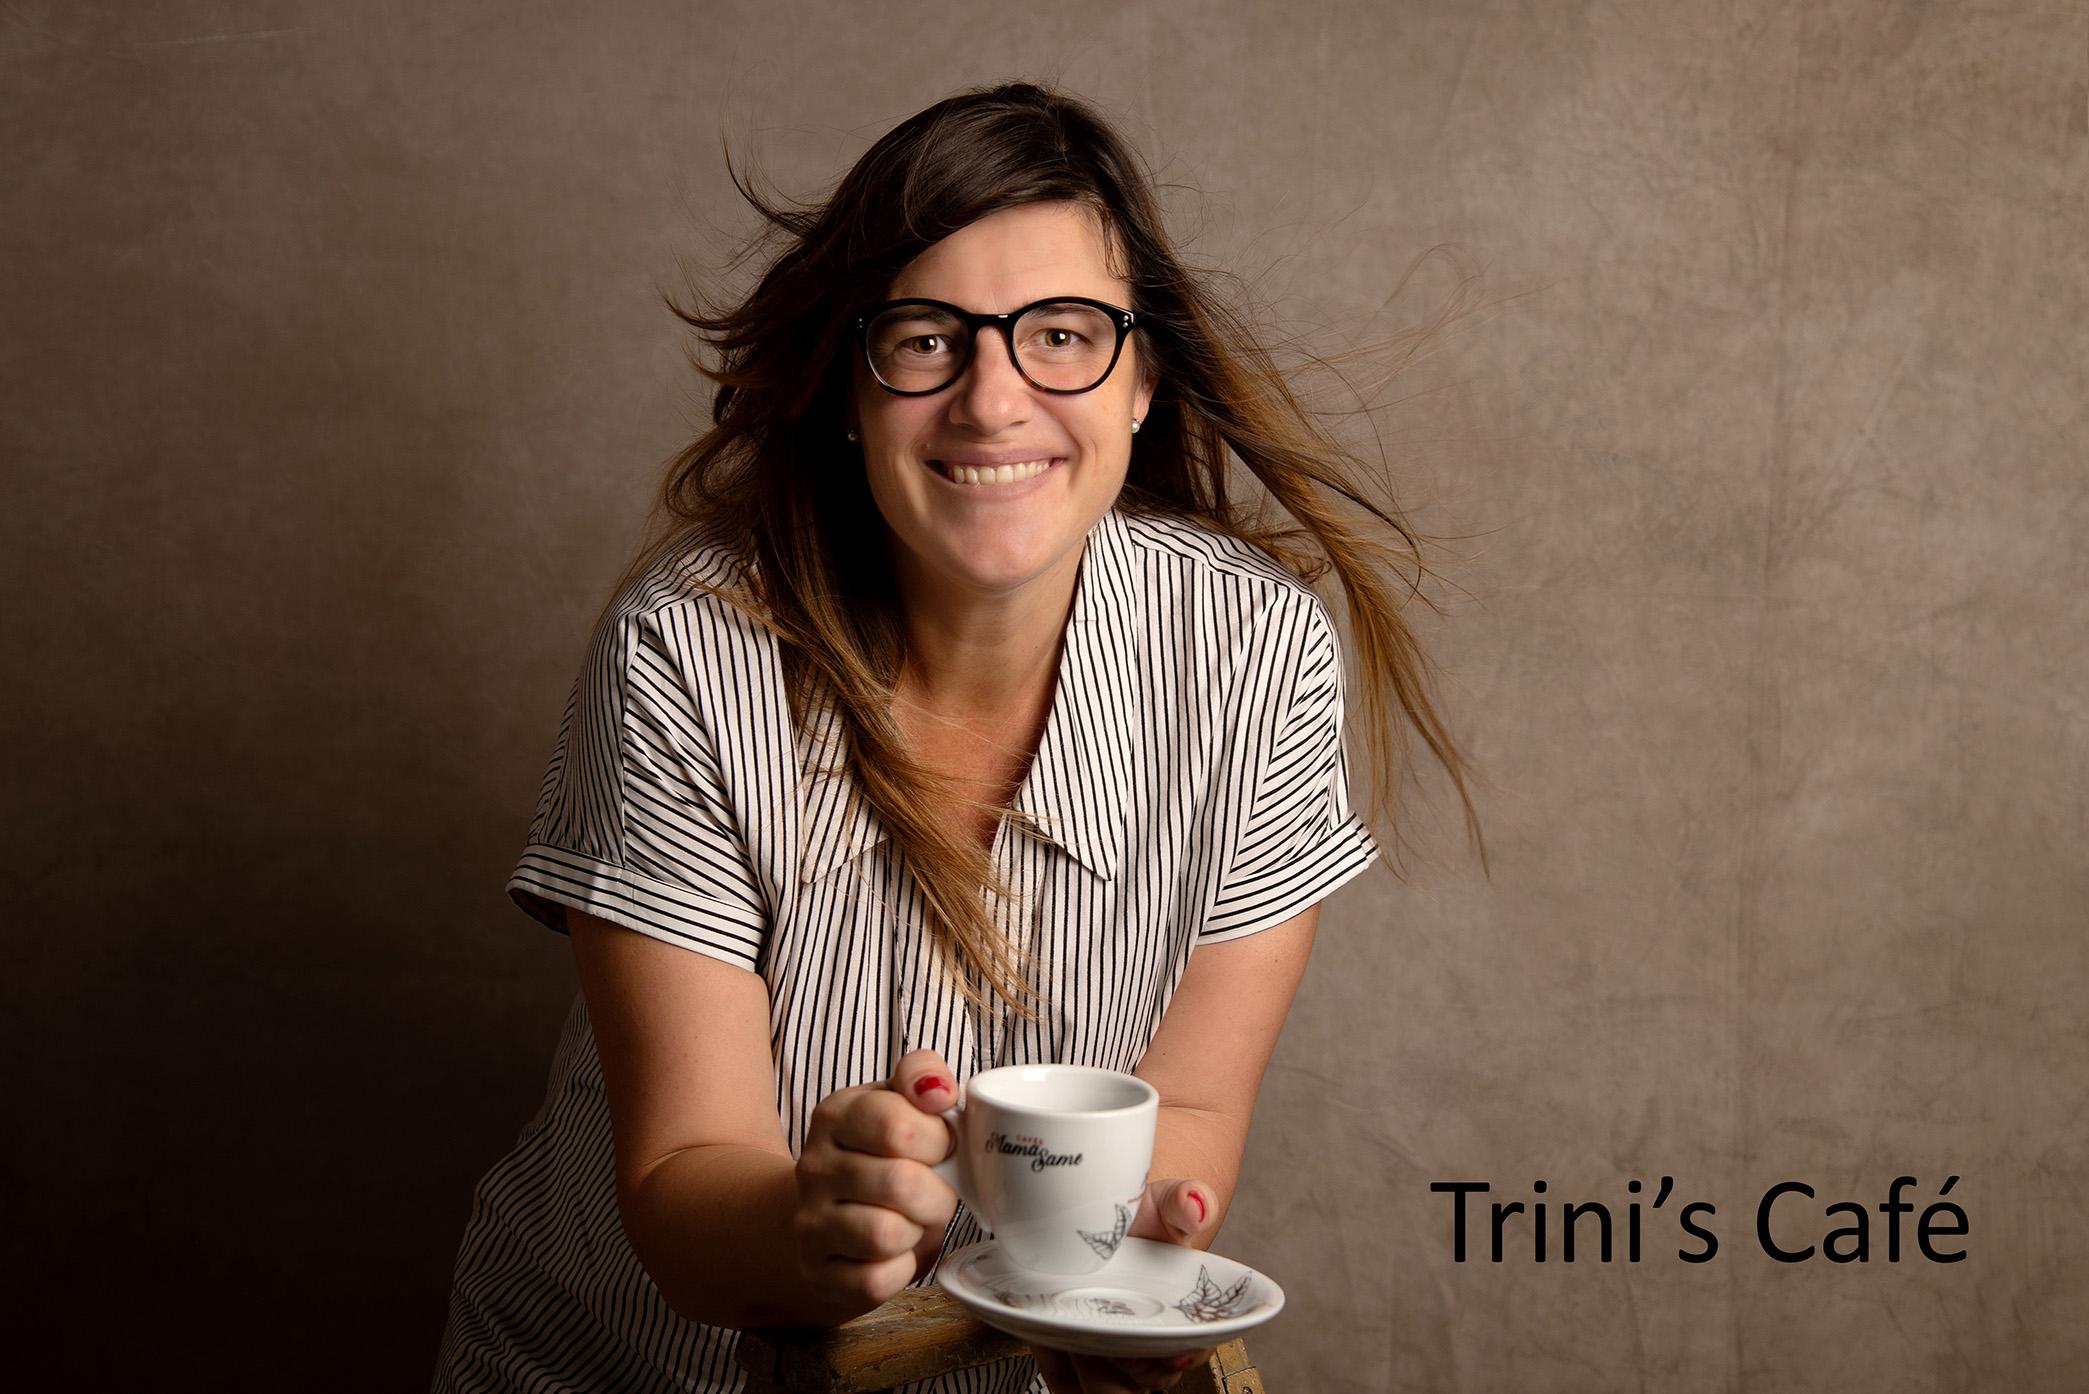 Trini's Café